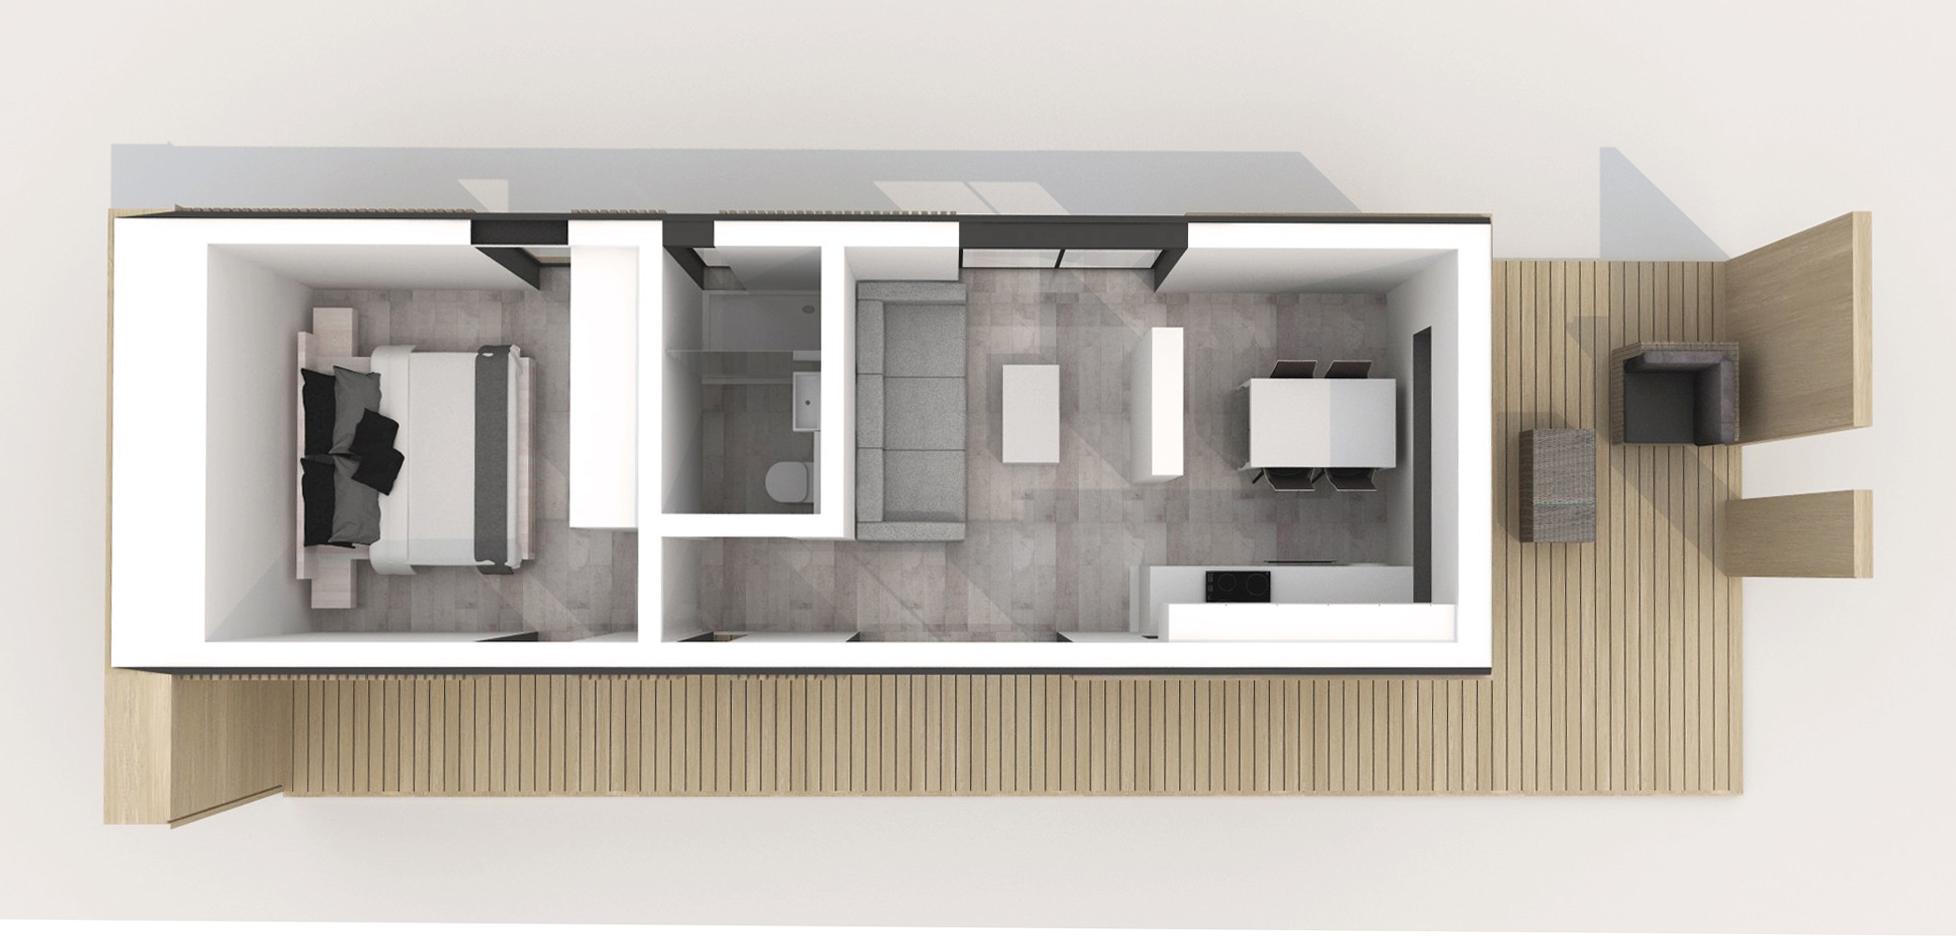 Проект Modern 35 - план этажа, фото 2